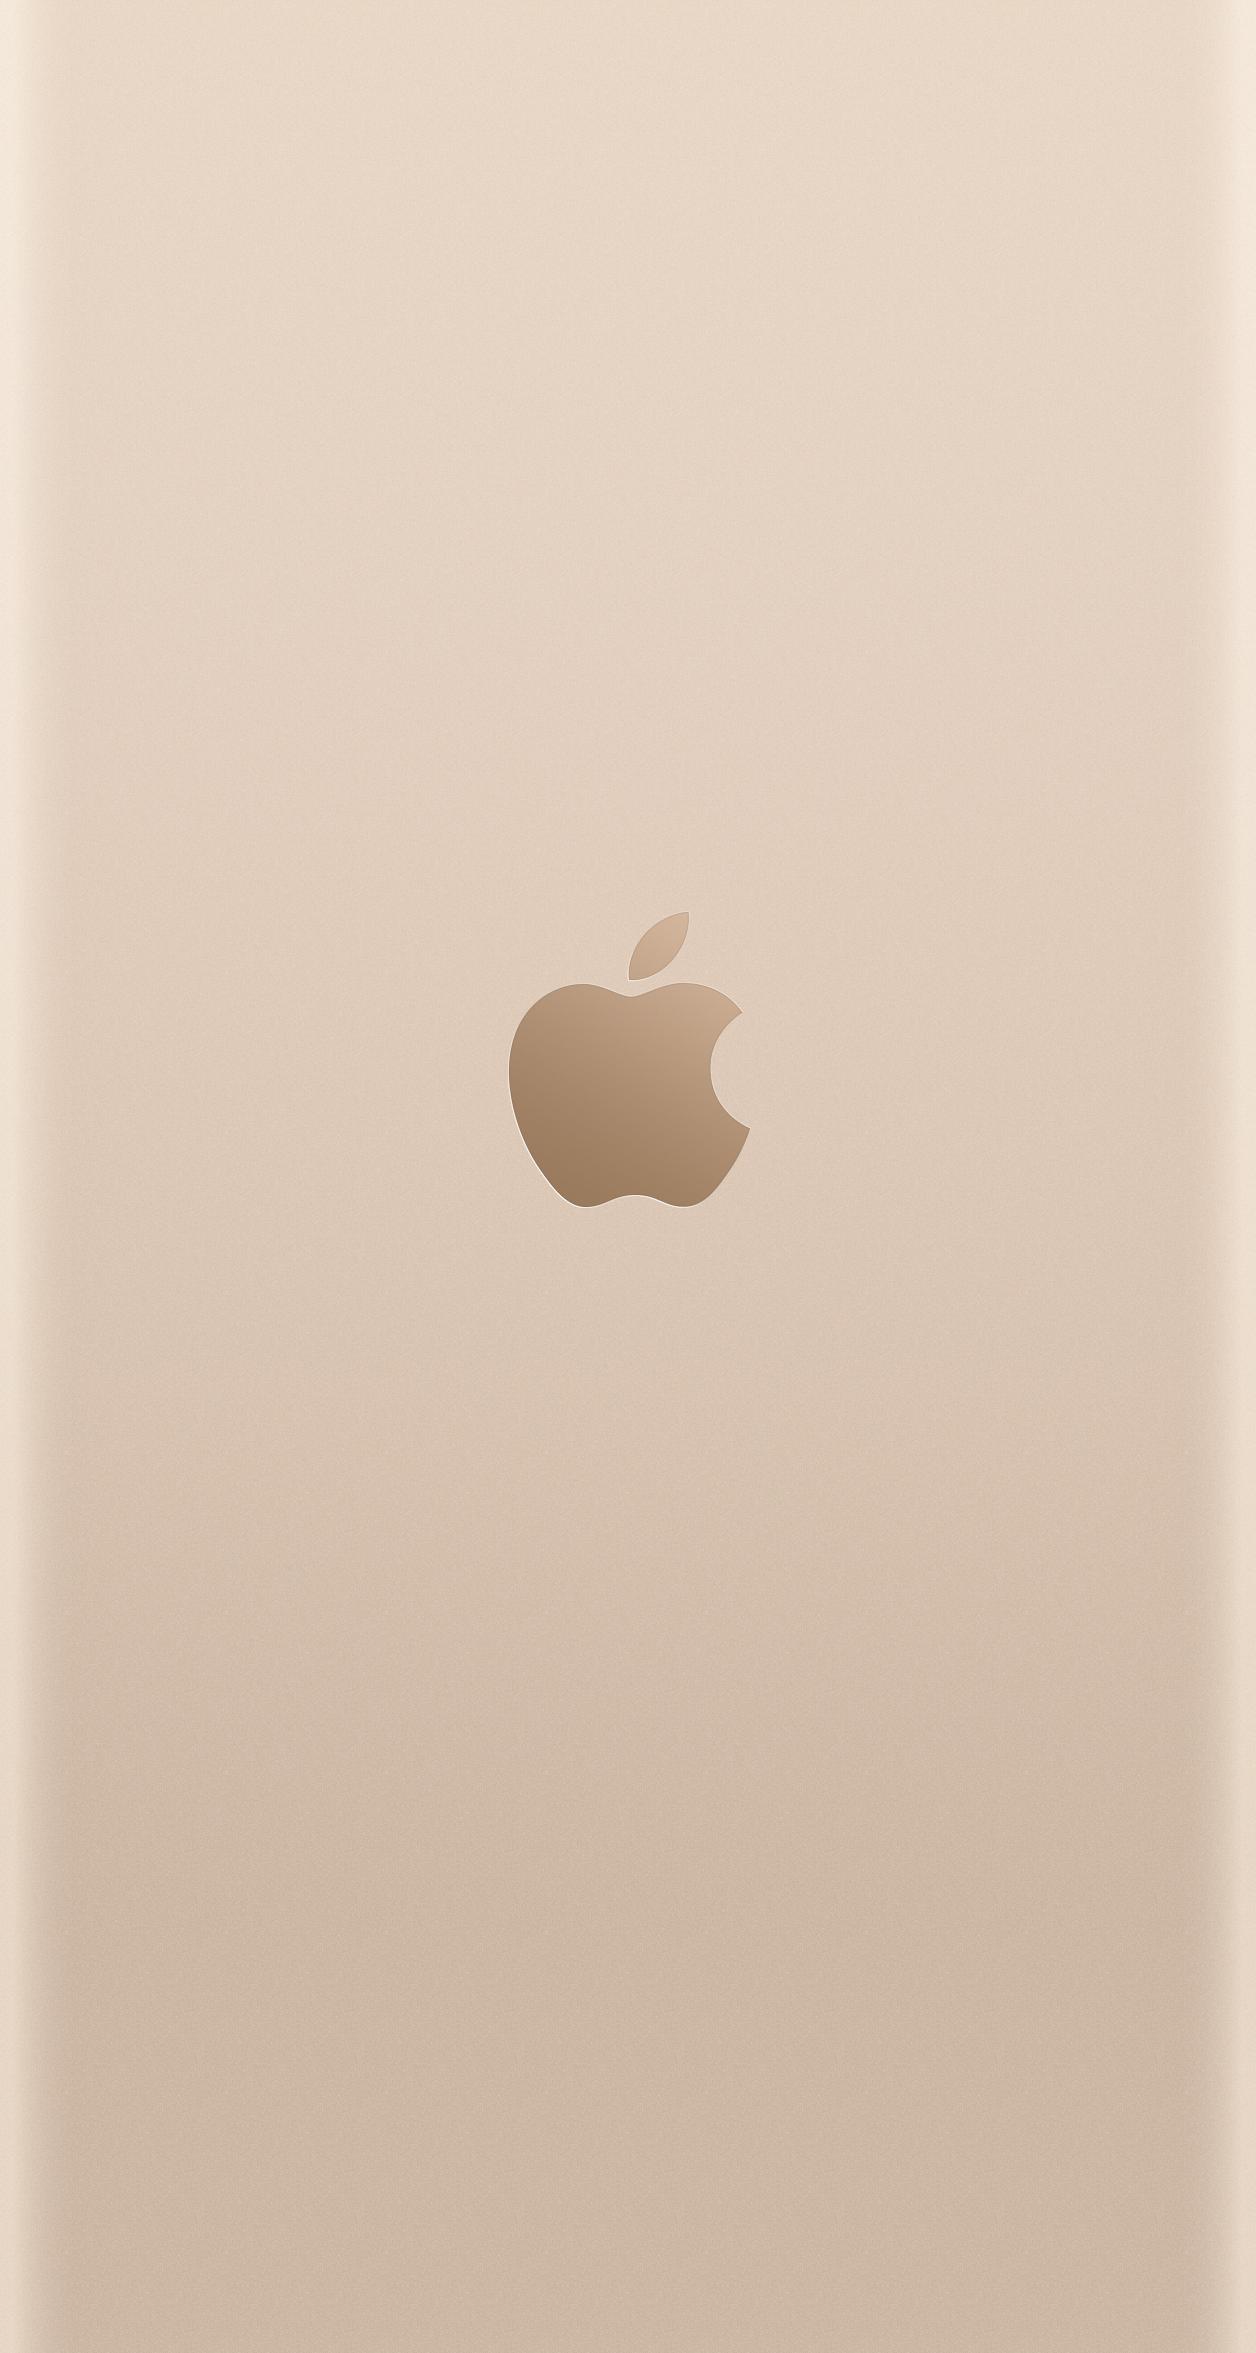 Ecran Iphone S Couleur